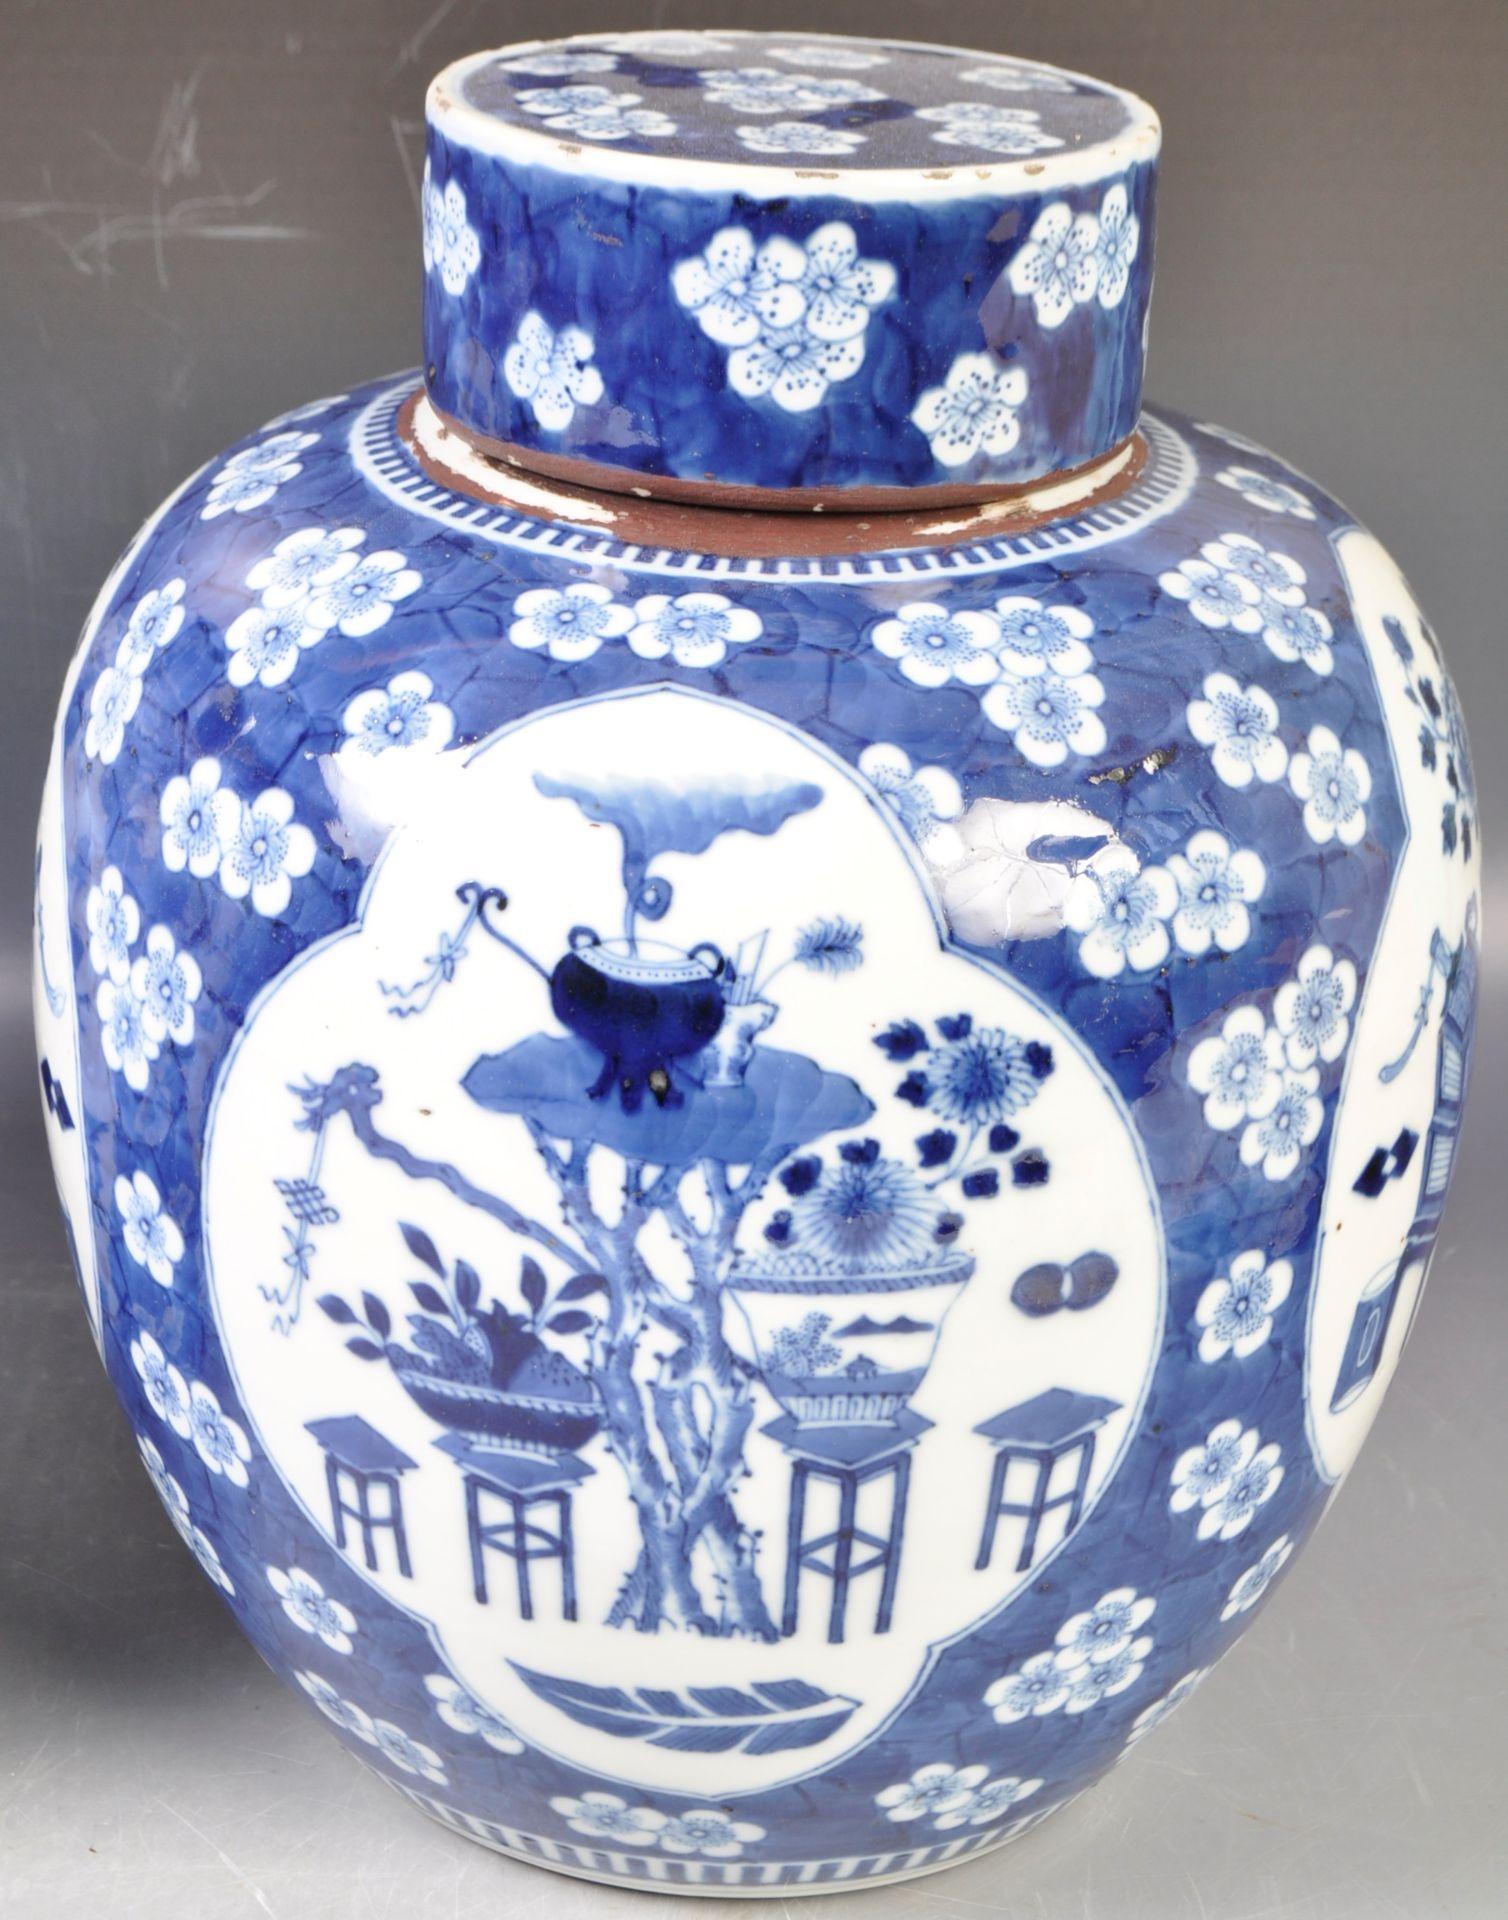 LARGE AND IMPRESSIVE PAIR OF CHINESE KANGXI MARK LIDDED JARS - Image 4 of 13